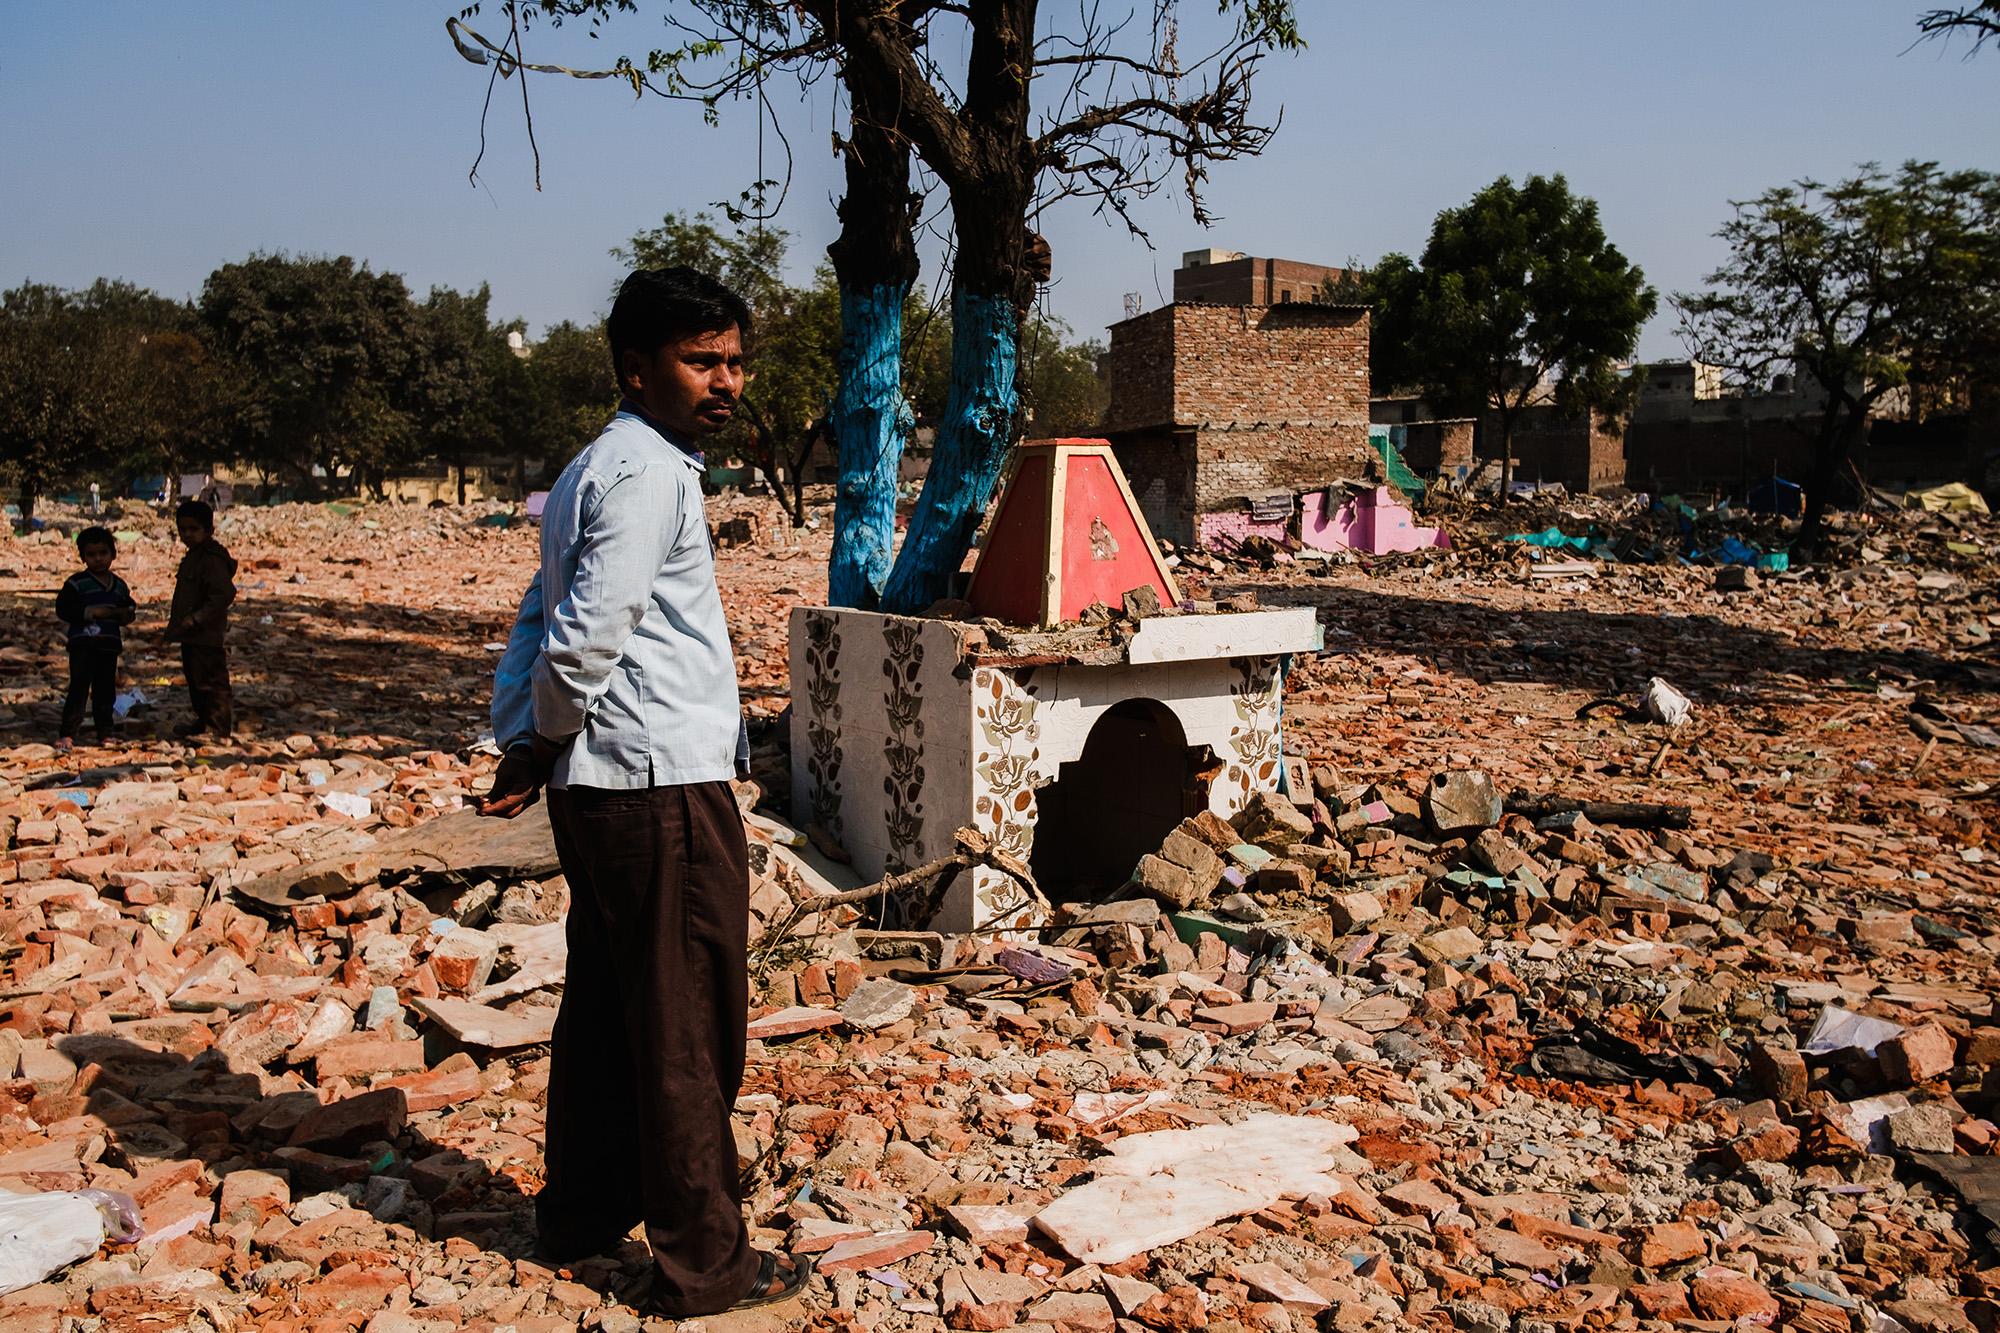 AnjaPoehlmann_India-Delhi_030.jpg